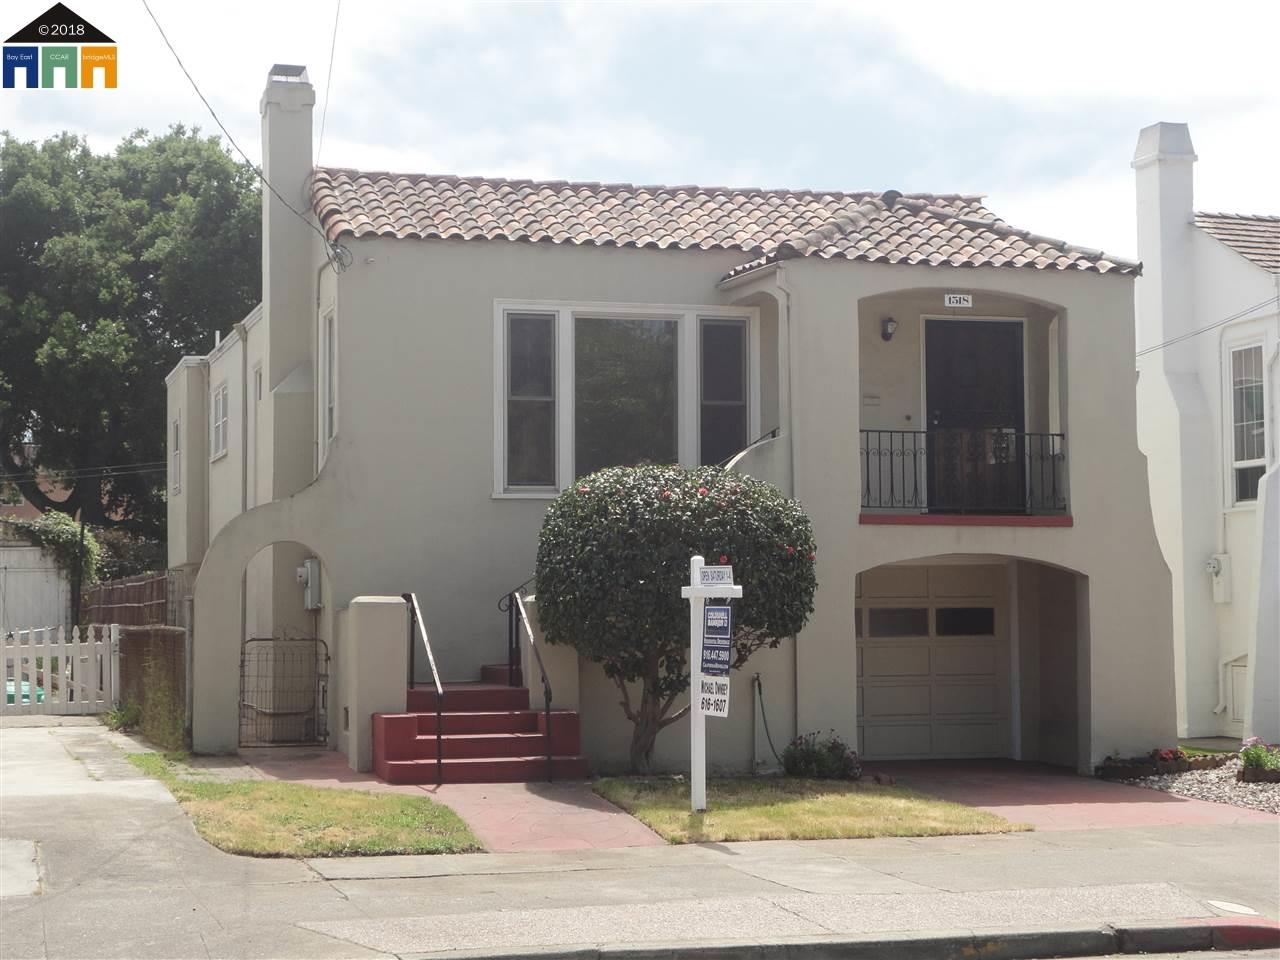 1518 Santa Clara Ave | ALAMEDA | 1184 | 94501